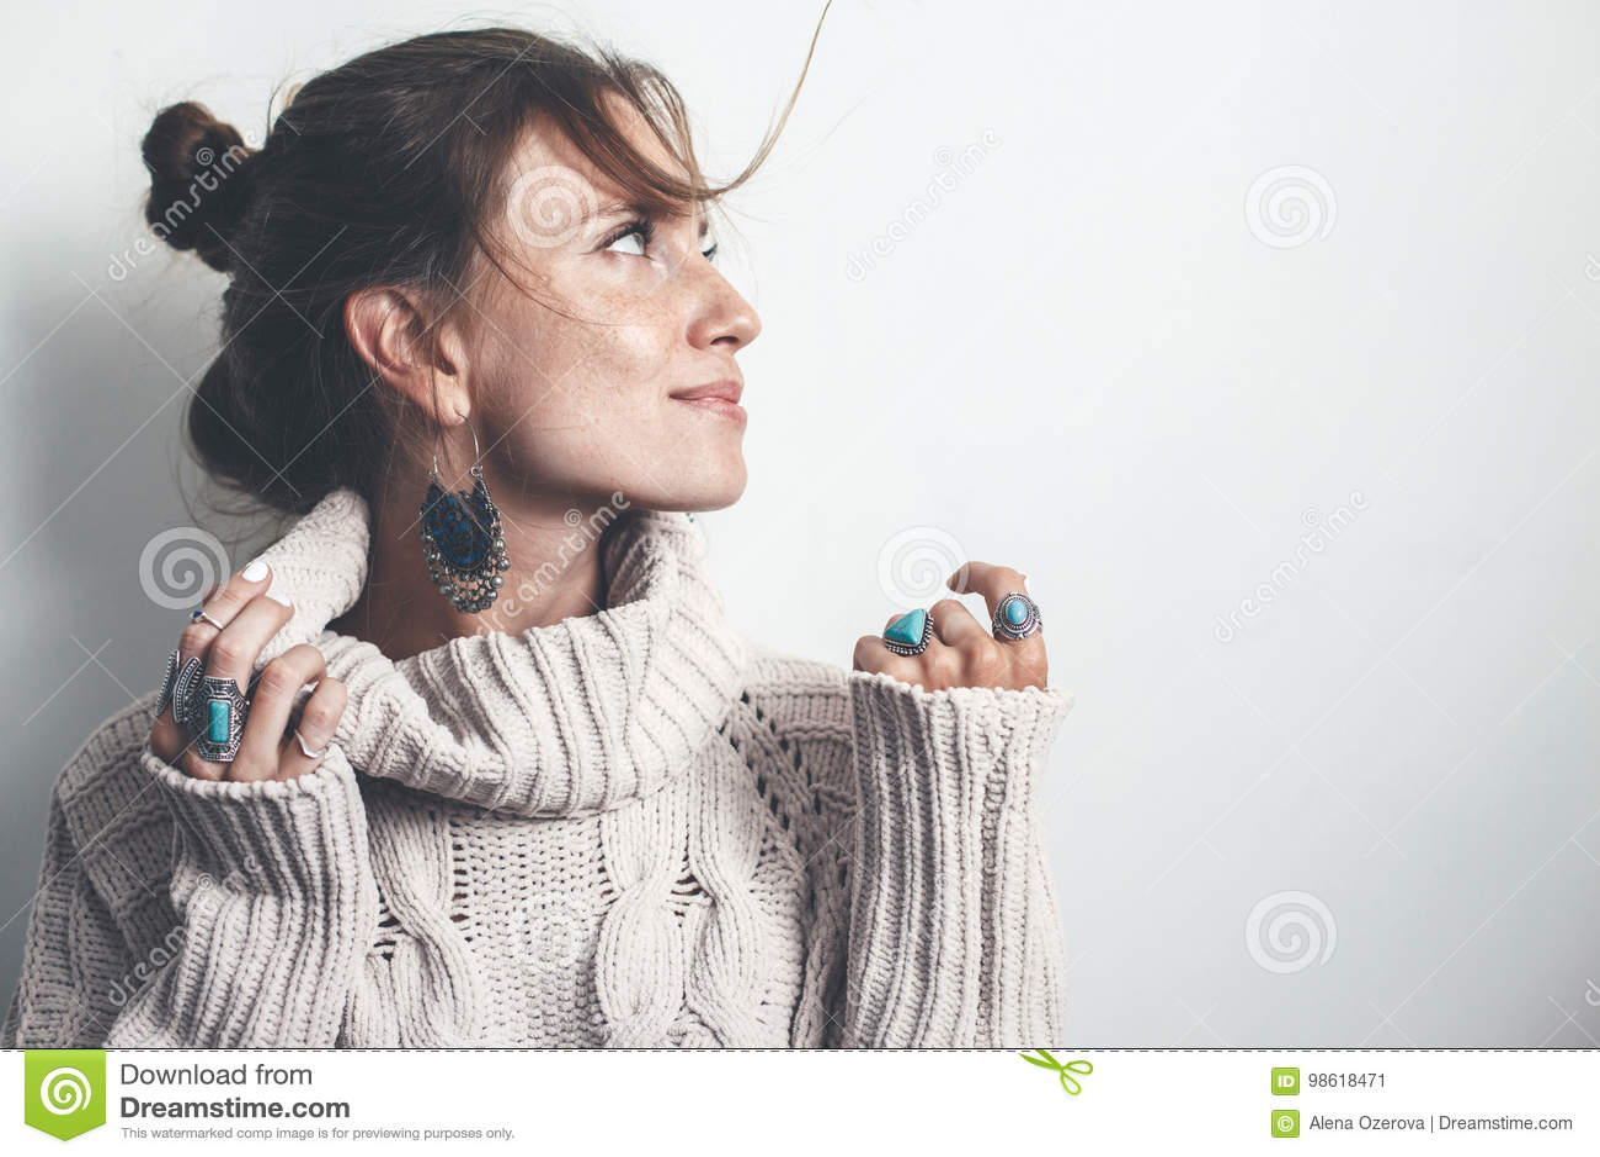 eaad9bb63952 Κόσμημα Boho και μάλλινο πουλόβερ στο πρότυπο Στοκ Εικόνα - εικόνα ...